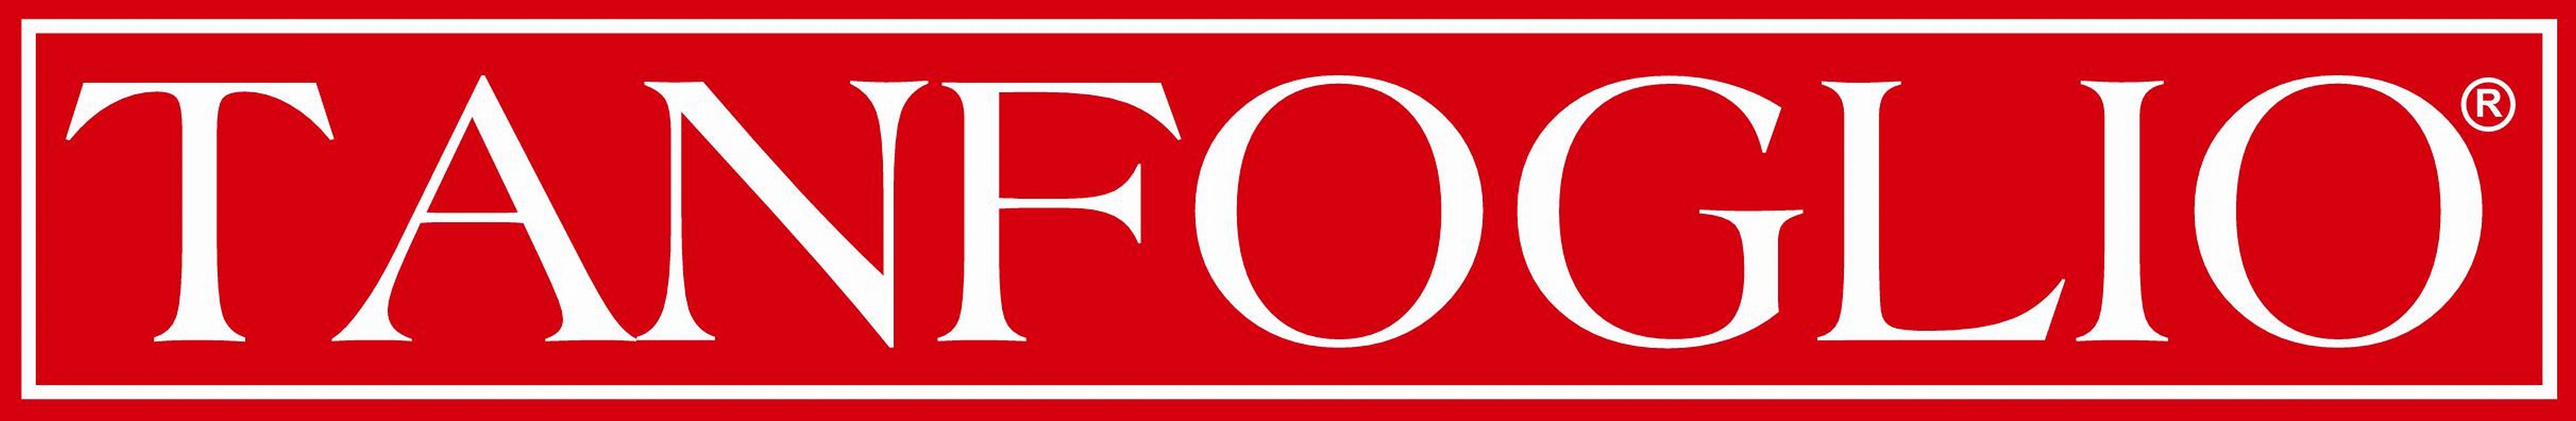 Fratelli Tanfoglio sas di Tanfoglio Massimo logo